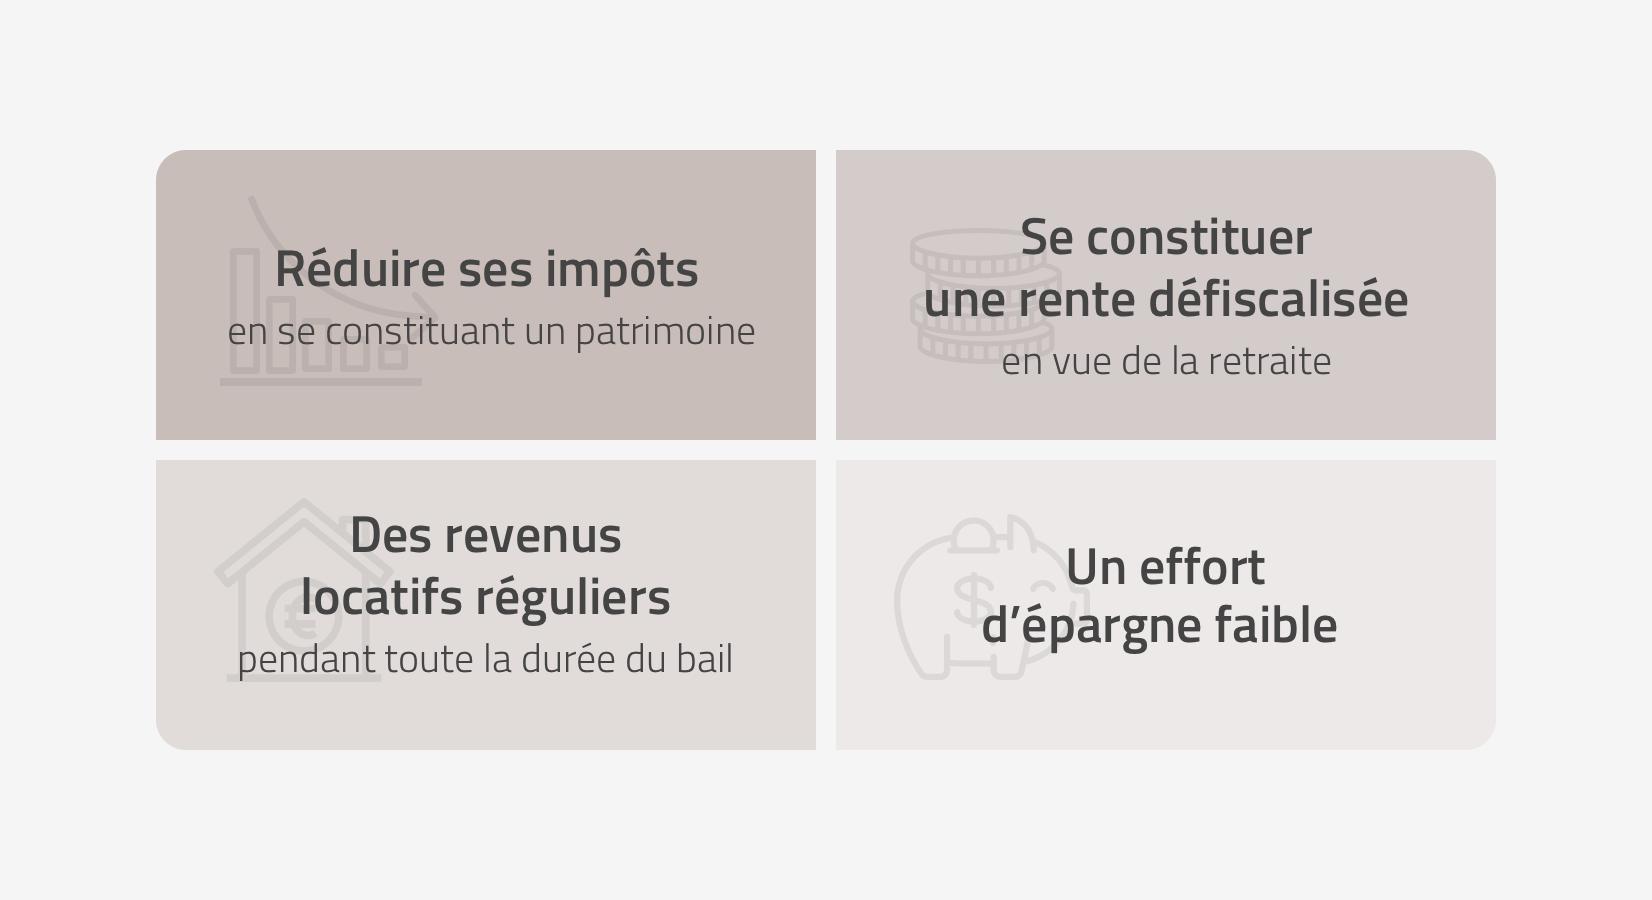 benefices_lmnp-censi-bouvard_coffim